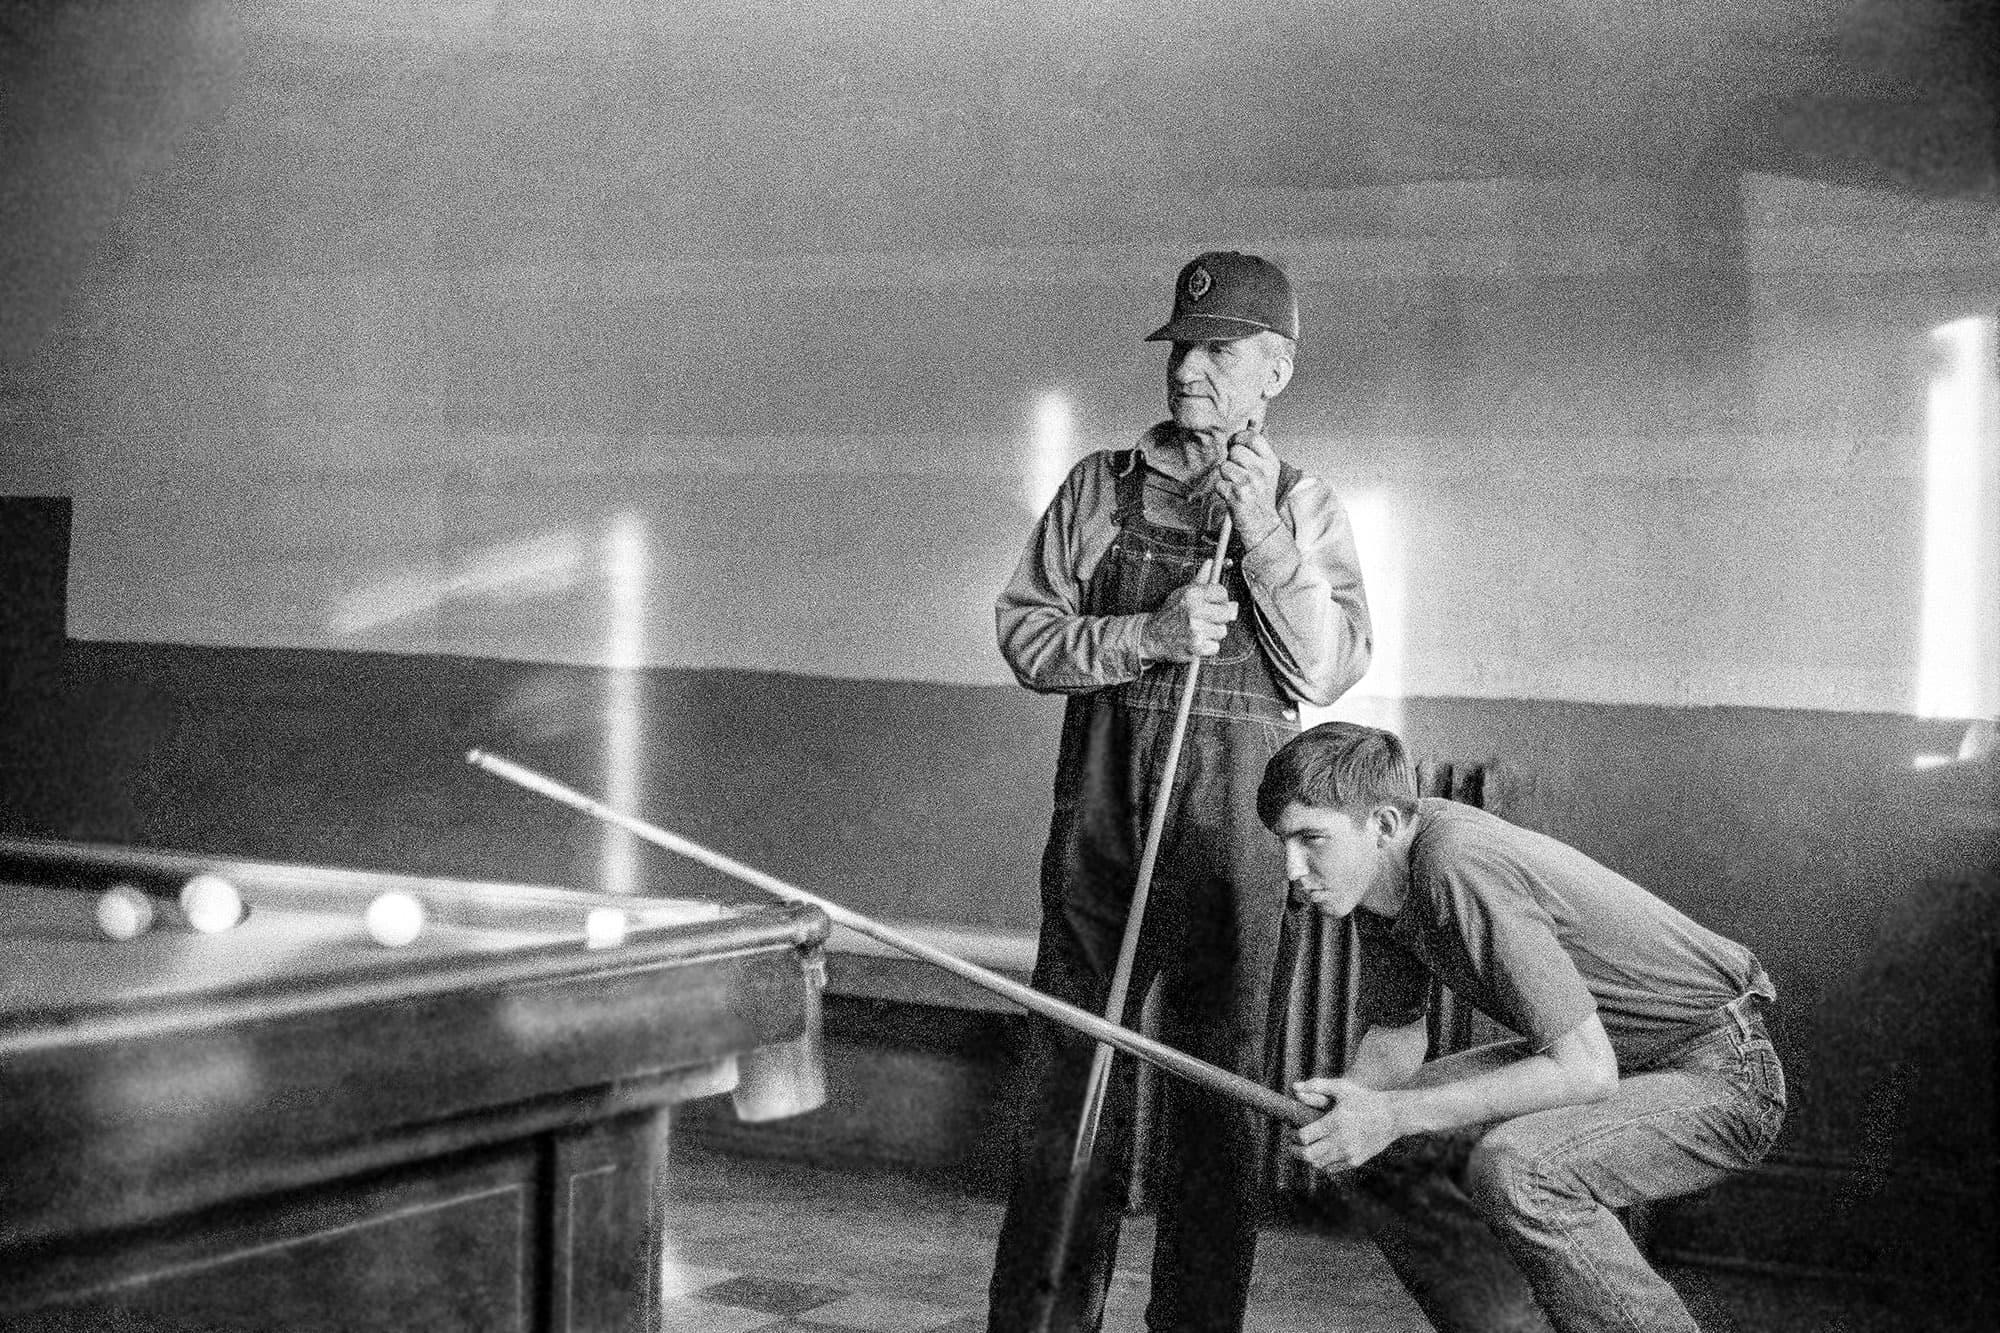 arthur-lazar-Pool-Players-Colorado-1971